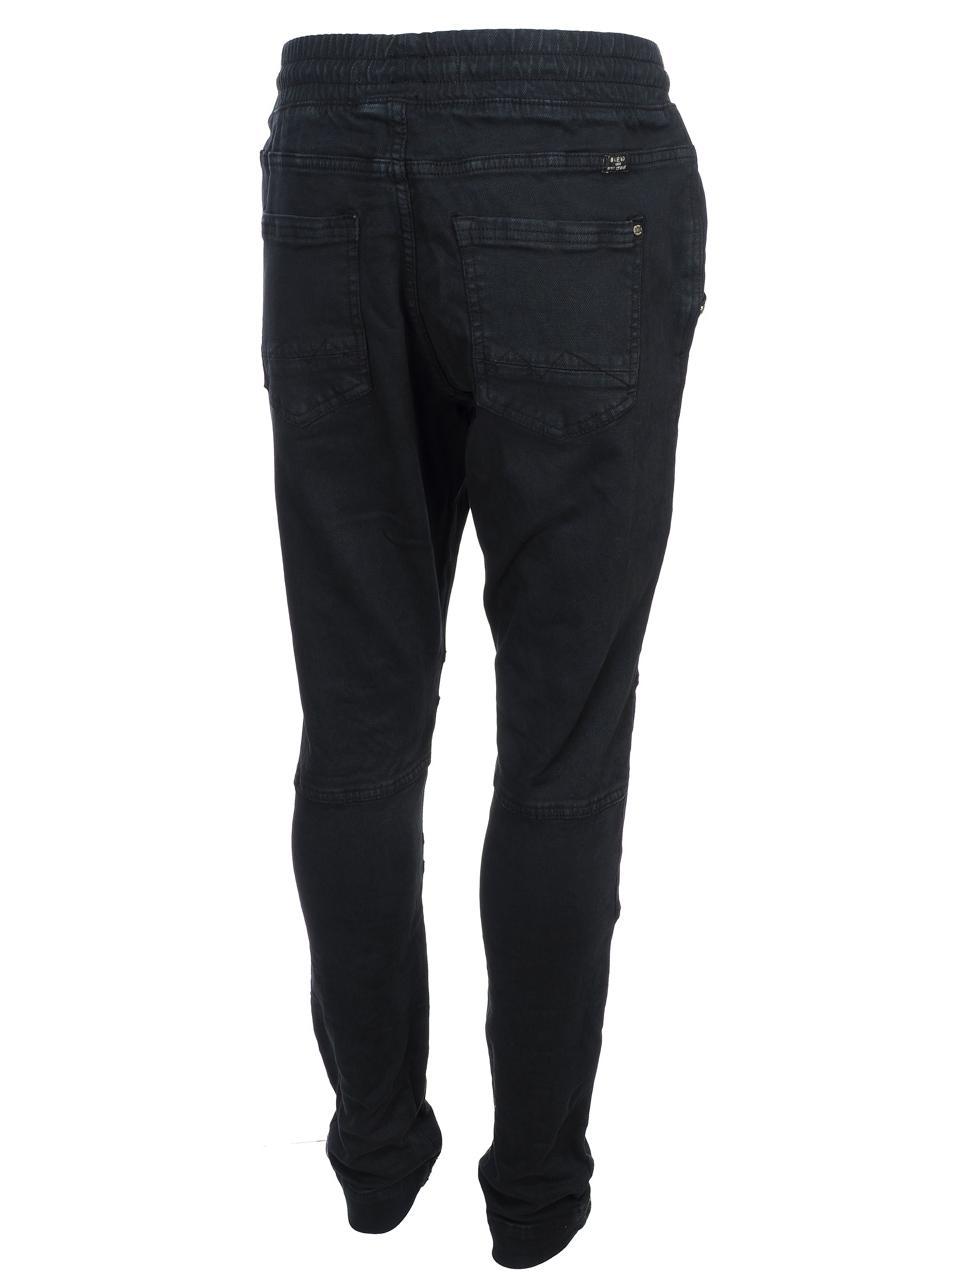 Pantalon-jeans-Blend-Jogg-jeans-34-denim-black-Noir-59114-Neuf miniature 5